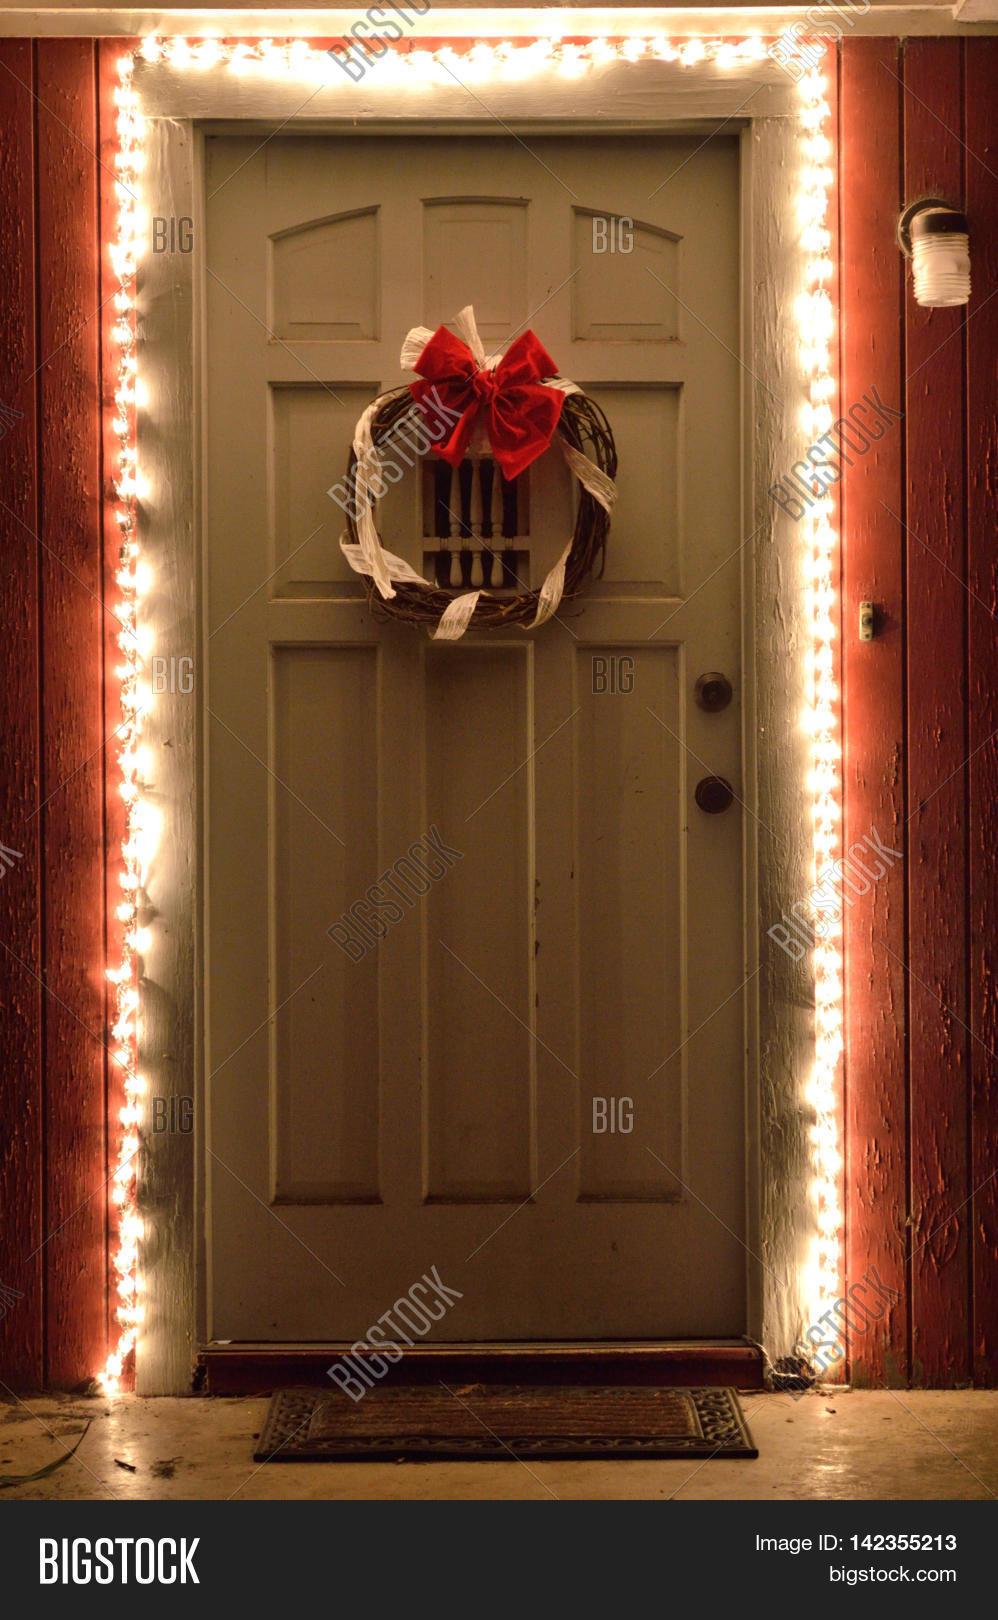 Front door christmas lights - Christmas Lights And Wreath On Front Door At Night